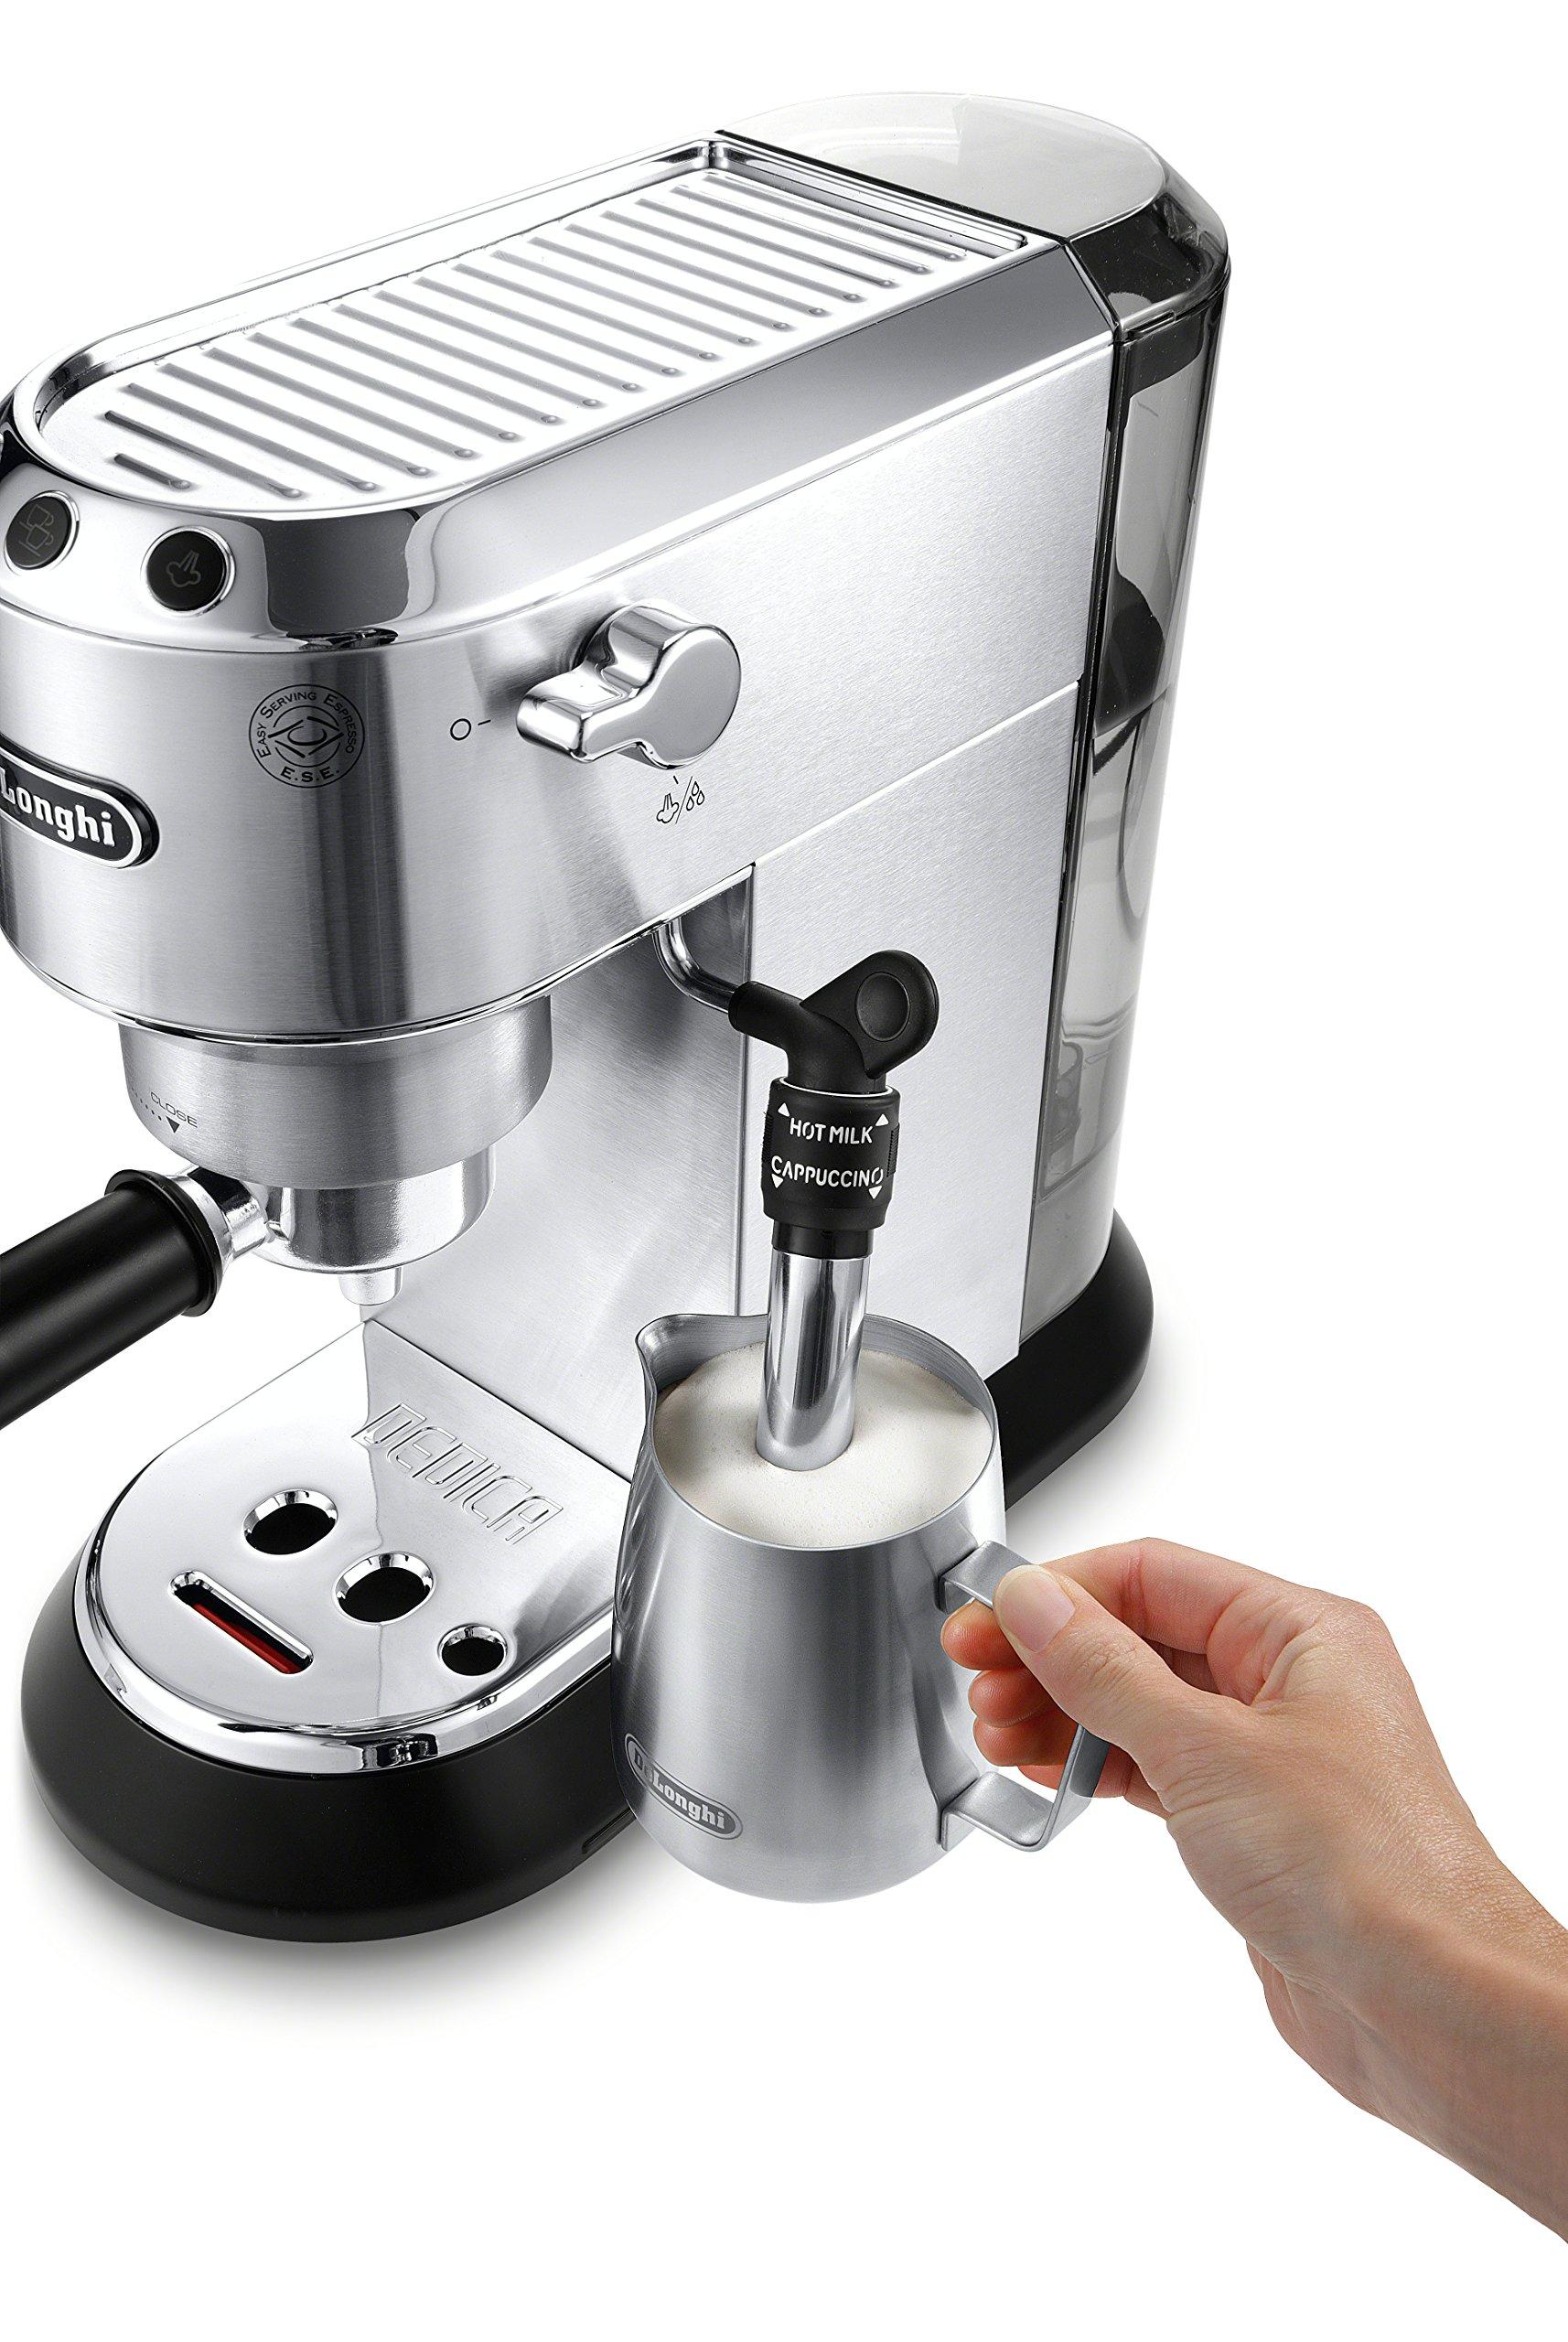 DeLonghi America, Inc EC685M Dedica Deluxe espresso, Silver by DeLonghi America, Inc (Image #3)